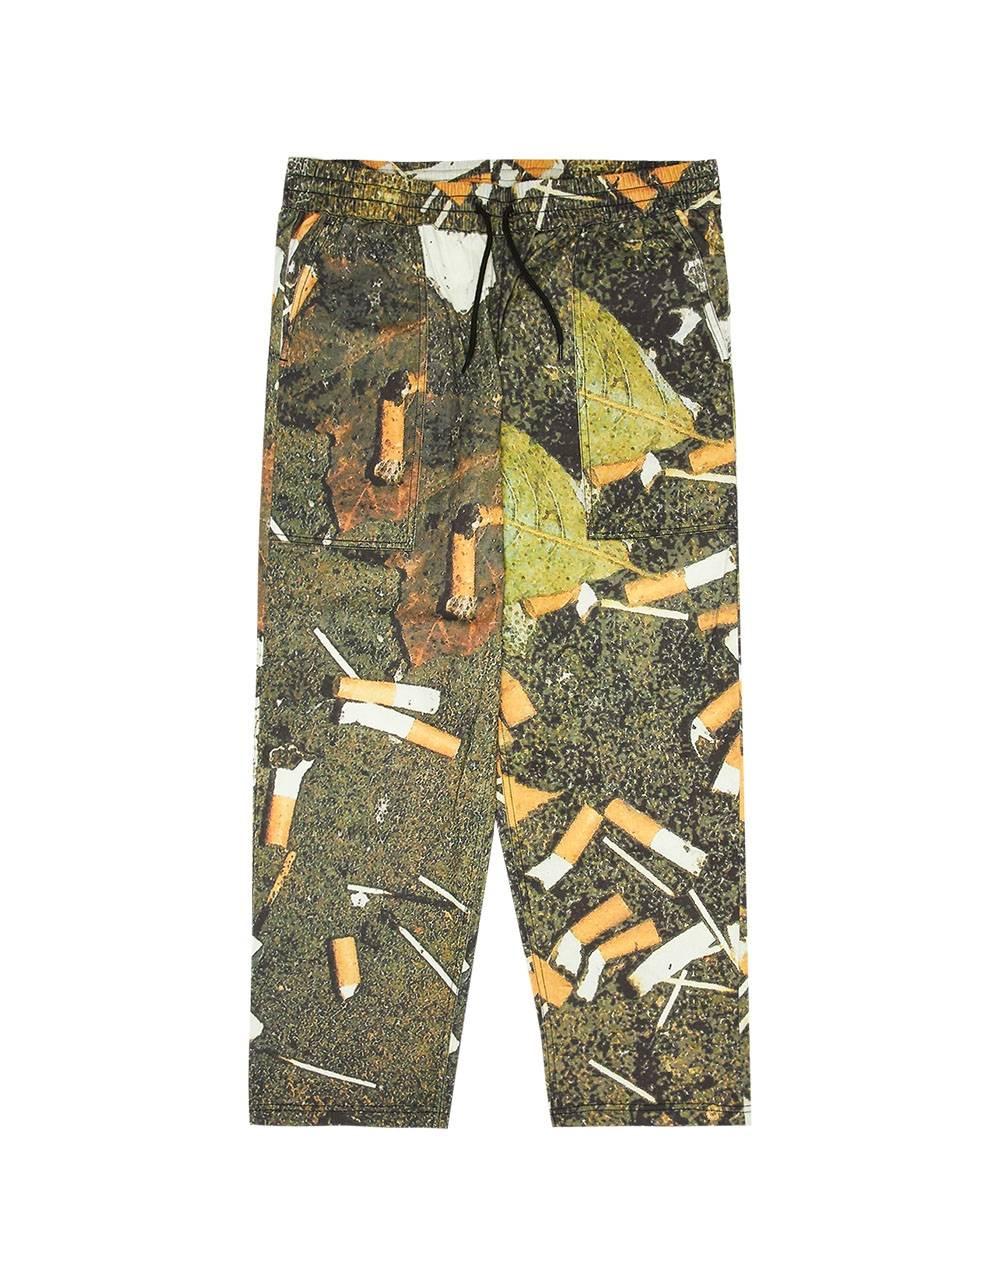 Pleasures Litter beach pants - multi Pleasures Pant 95,08€